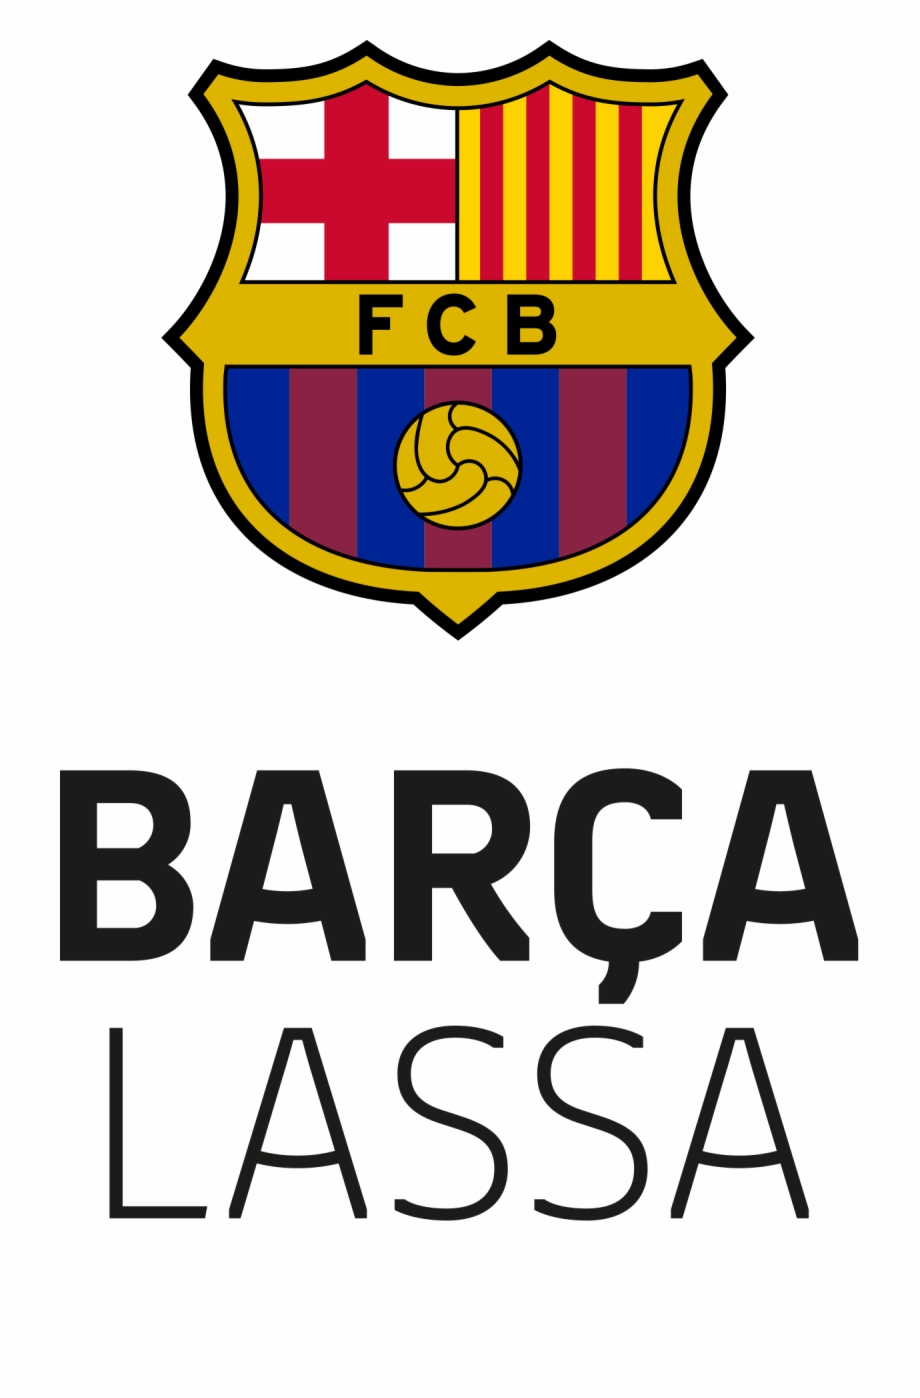 Fc Barcelona Lassa Logo, Transparent Png Download For Free #1029815.